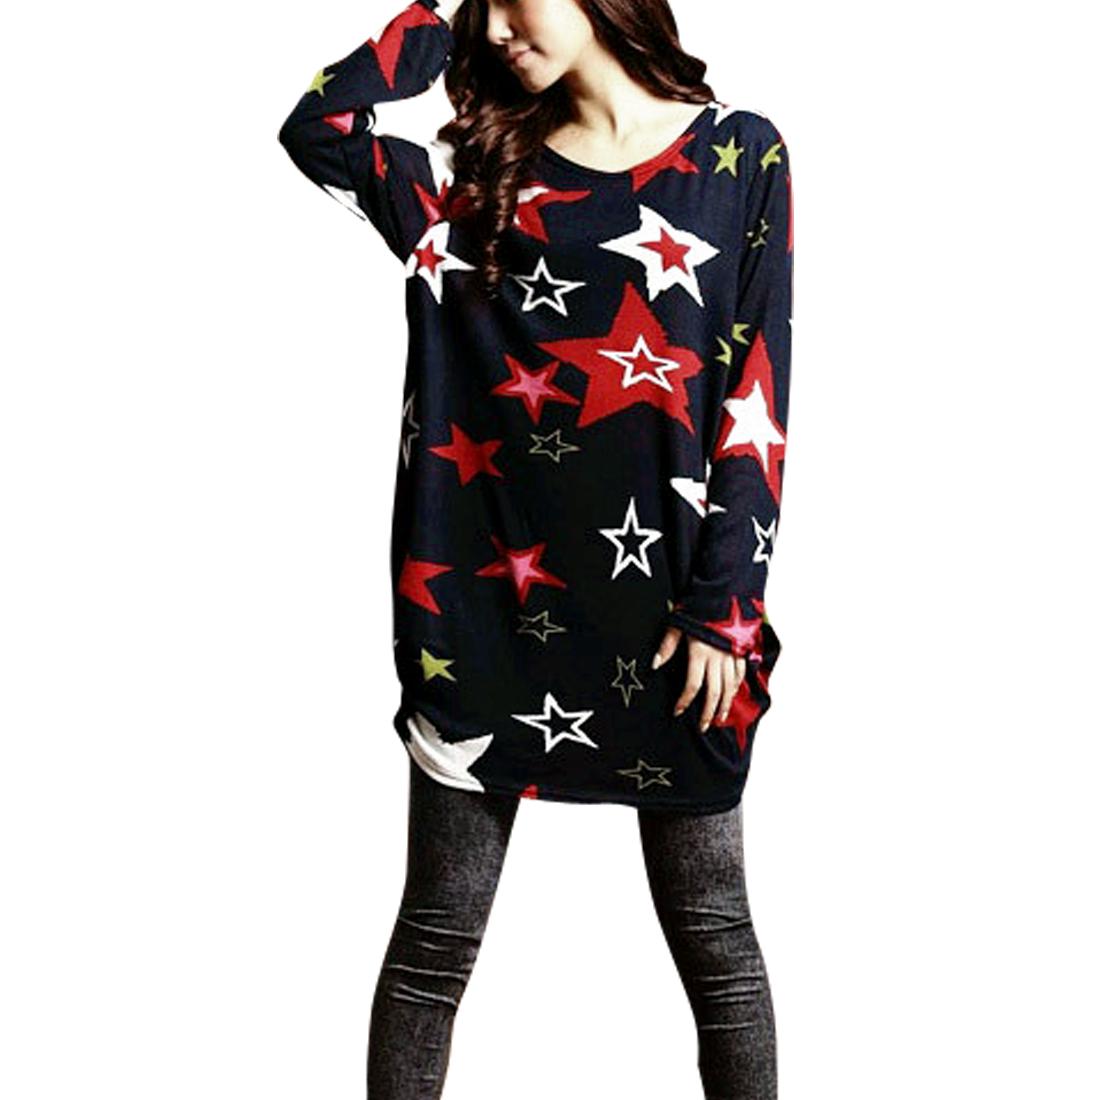 Women Scoop Neck Stars Pattern Navy Blue Knit Tunic Shirt S